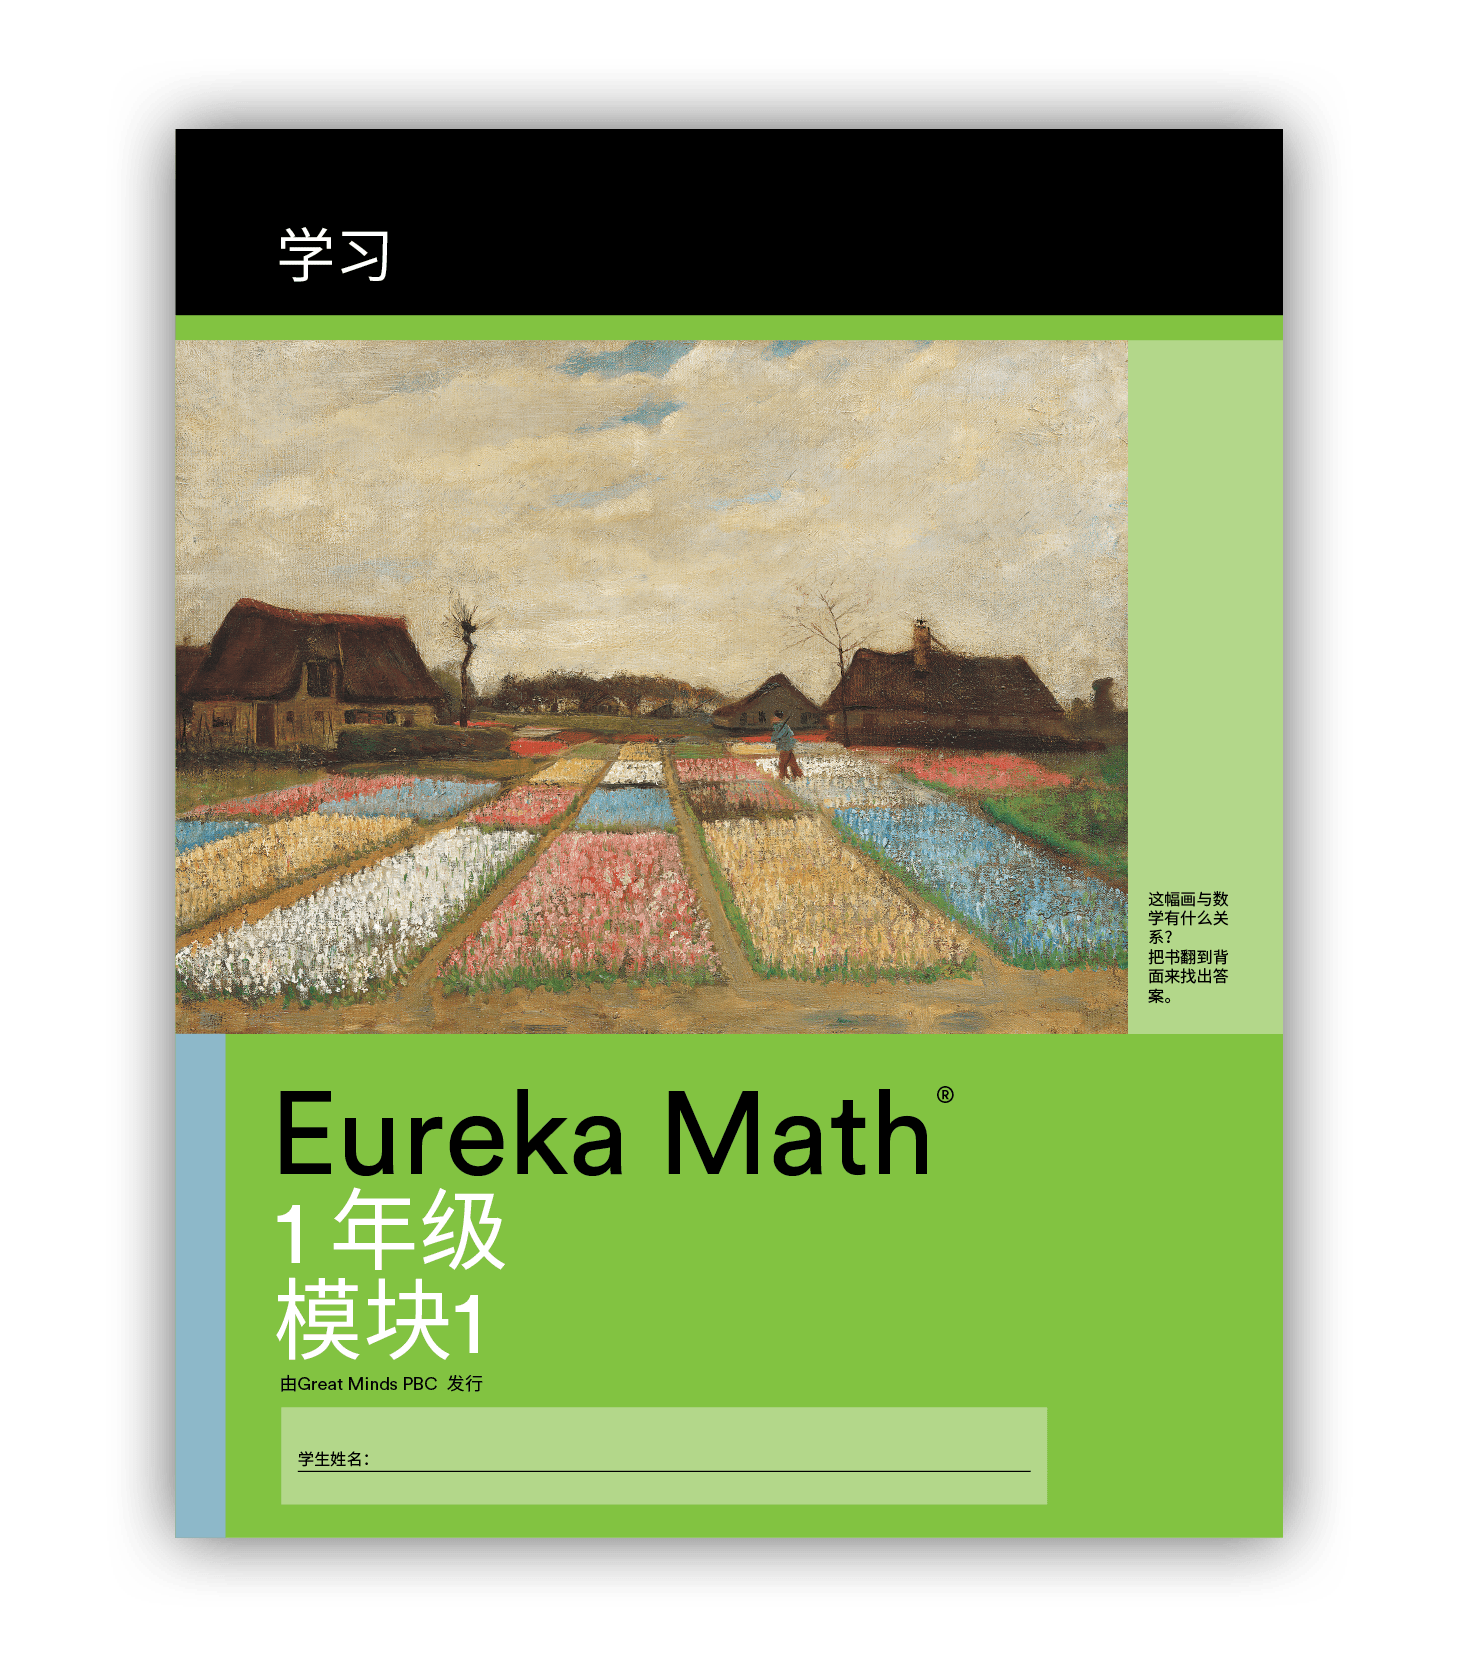 Eureka-Math-Learn-G1_Chinese